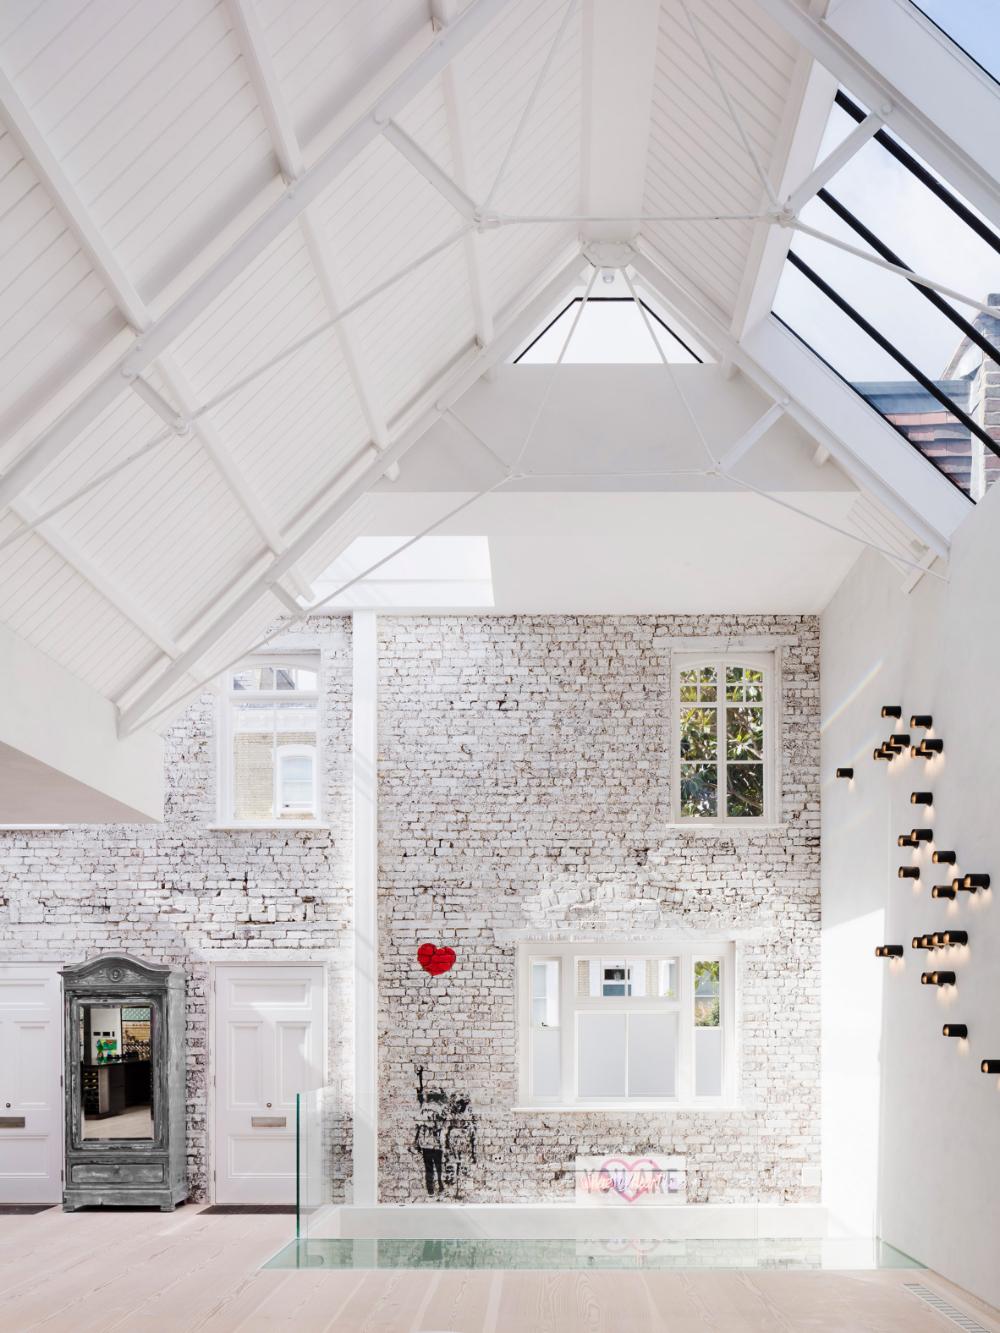 Rodić Davidson merges art studios to create home in London